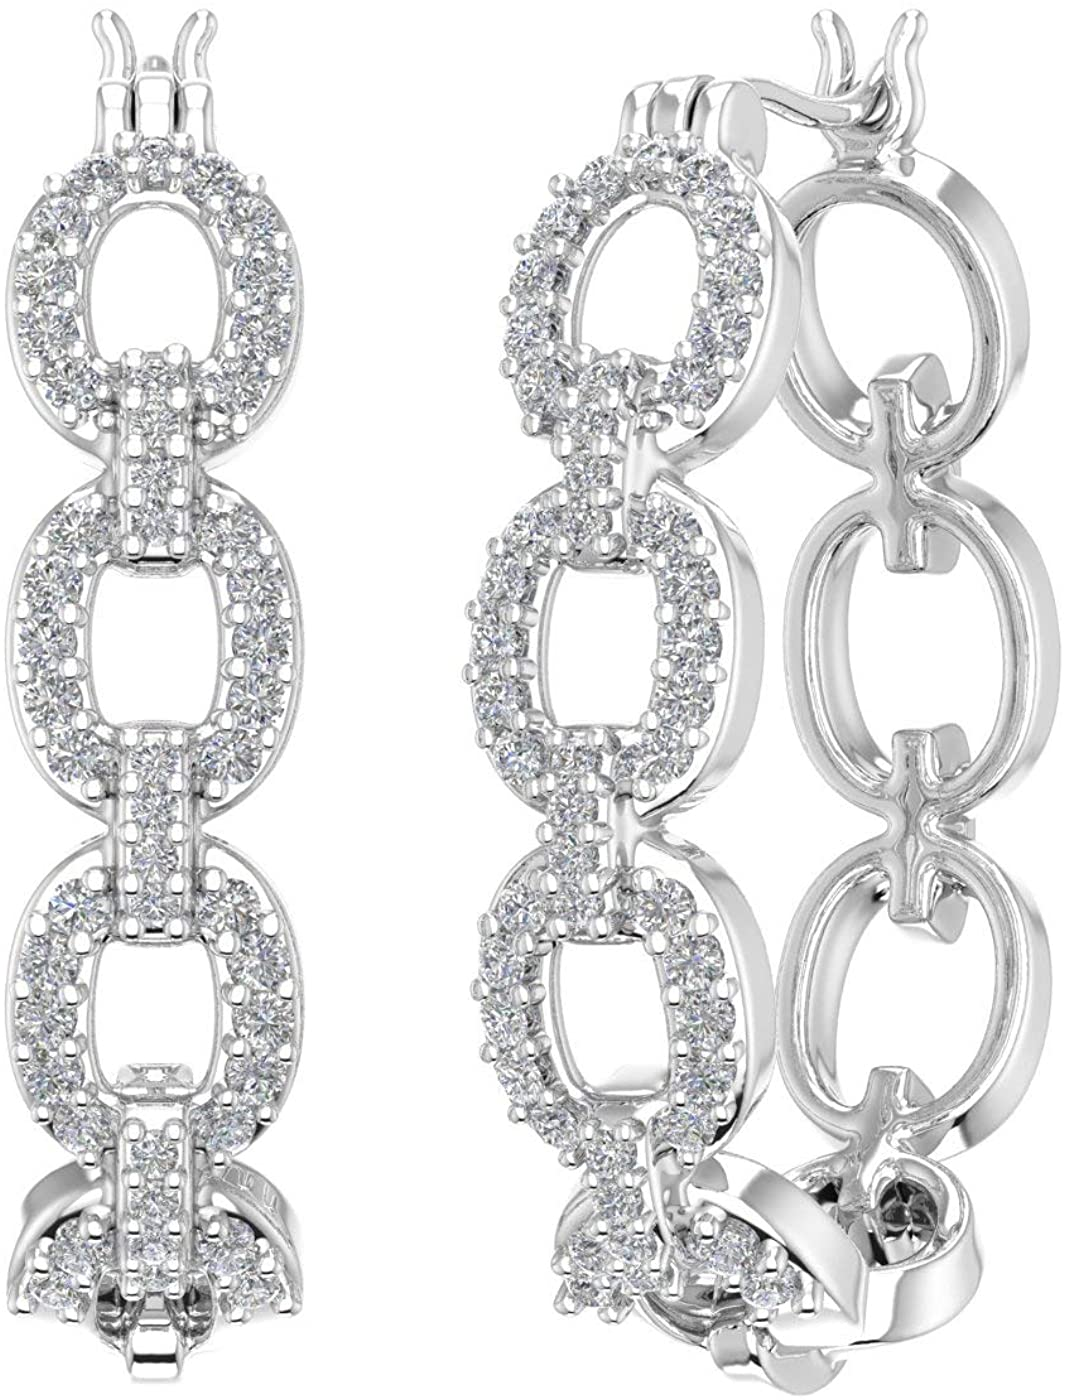 1/2 Carat Diamond Linked Hoop Earrings in 10K Gold